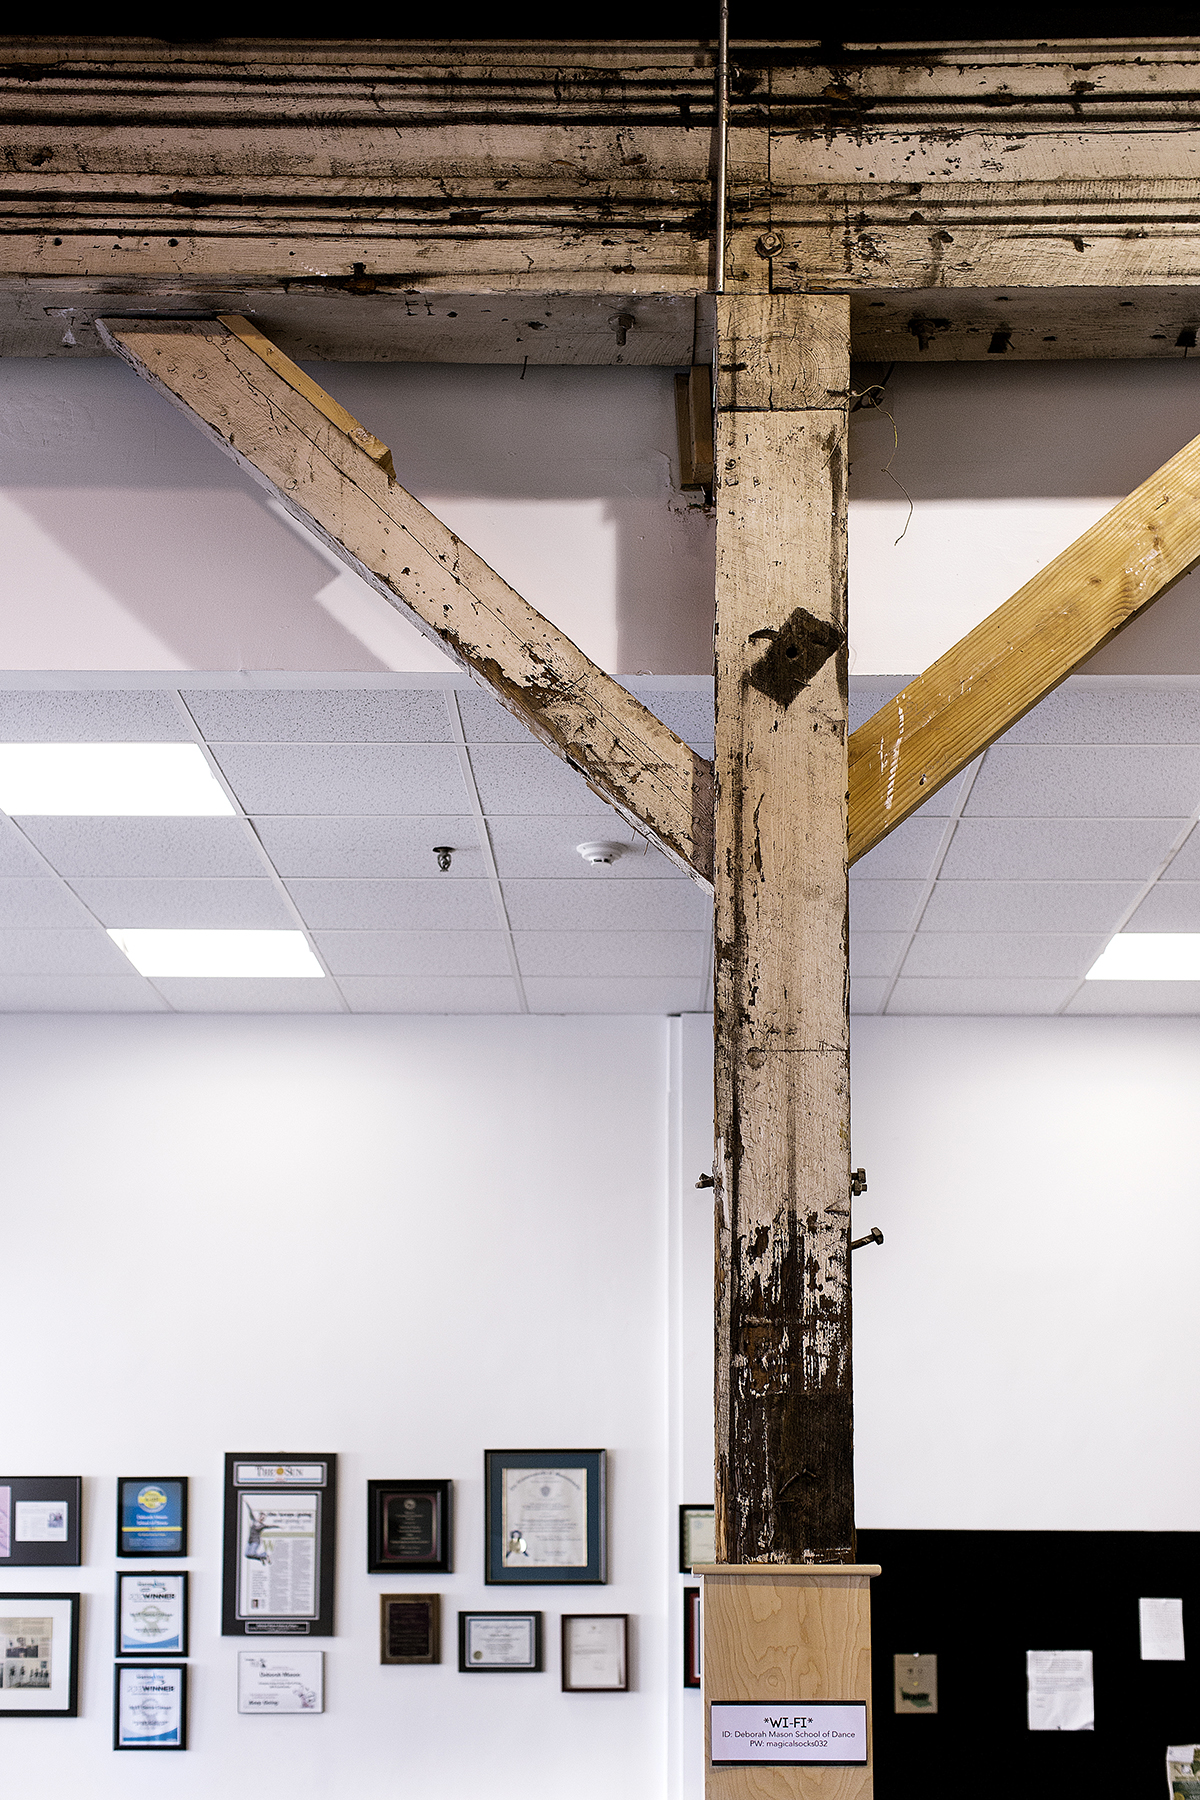 Tricia-Kendall-Architecture-0019